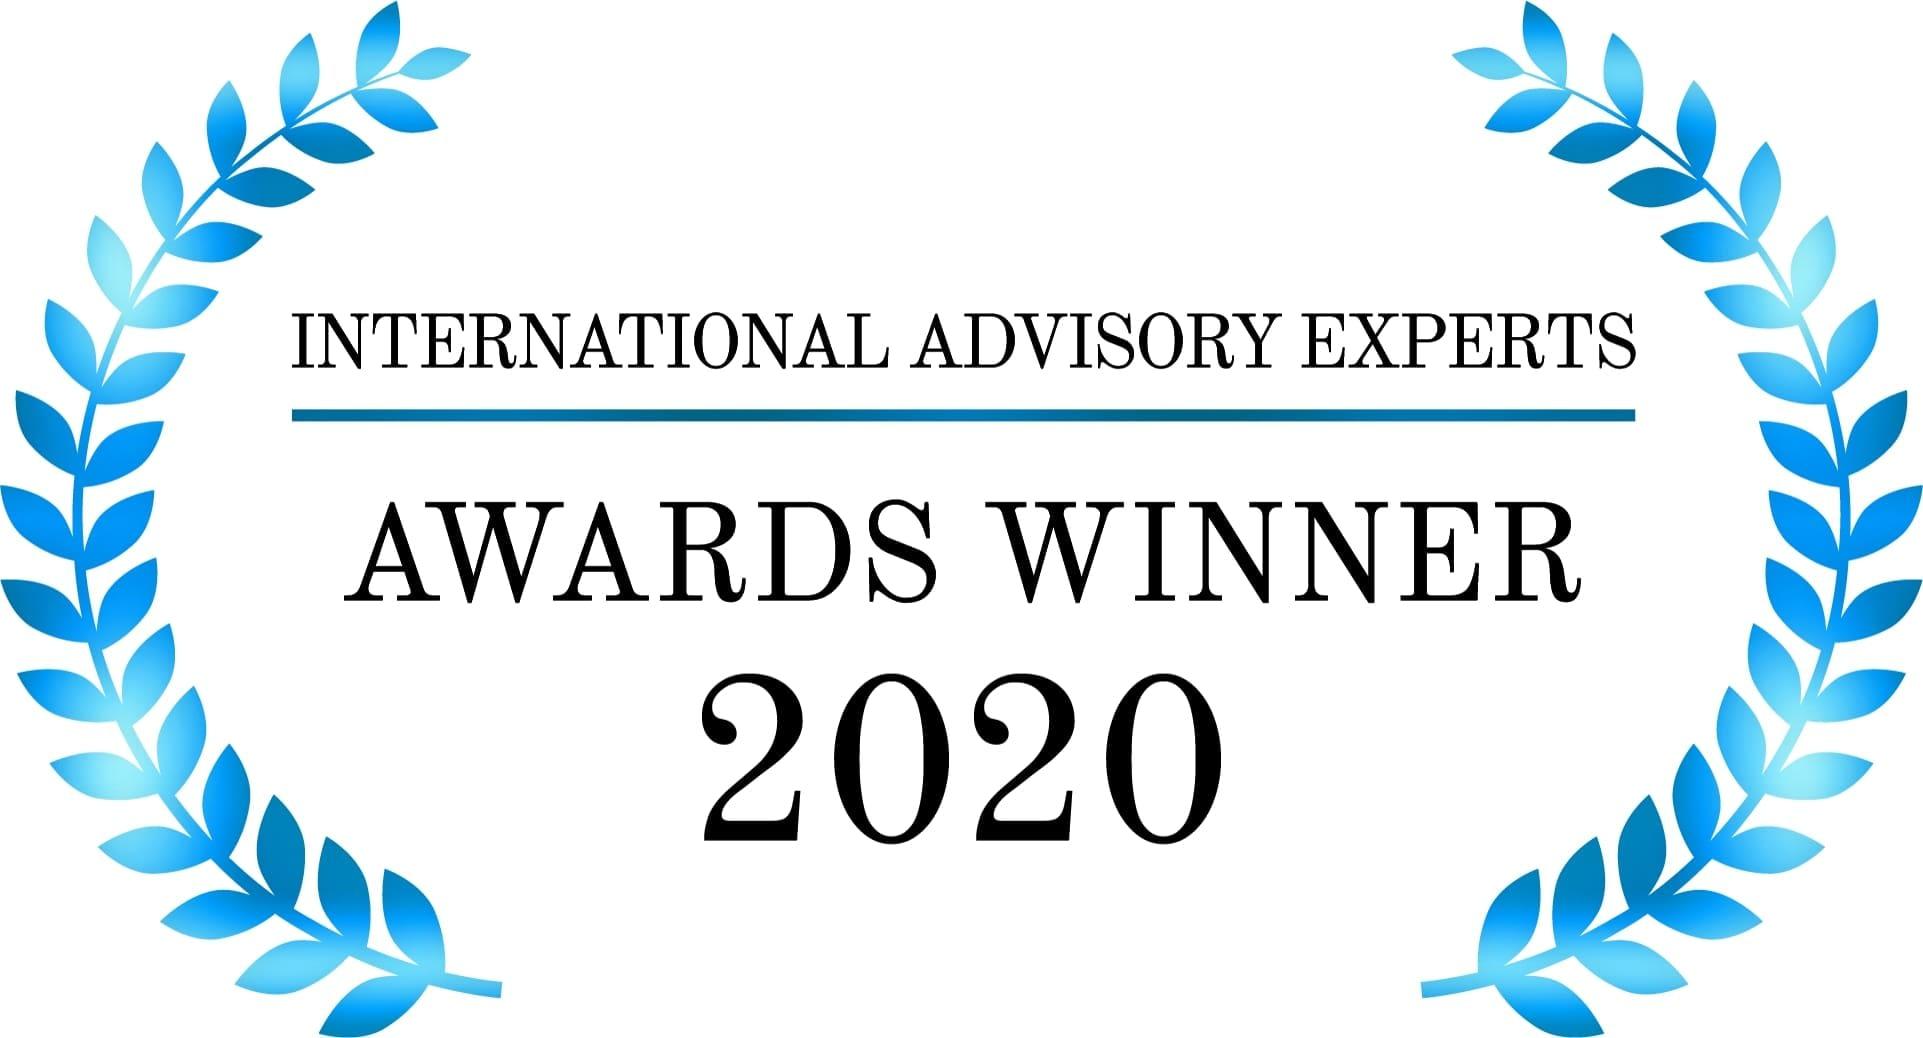 Award Winner International Advisory Experts